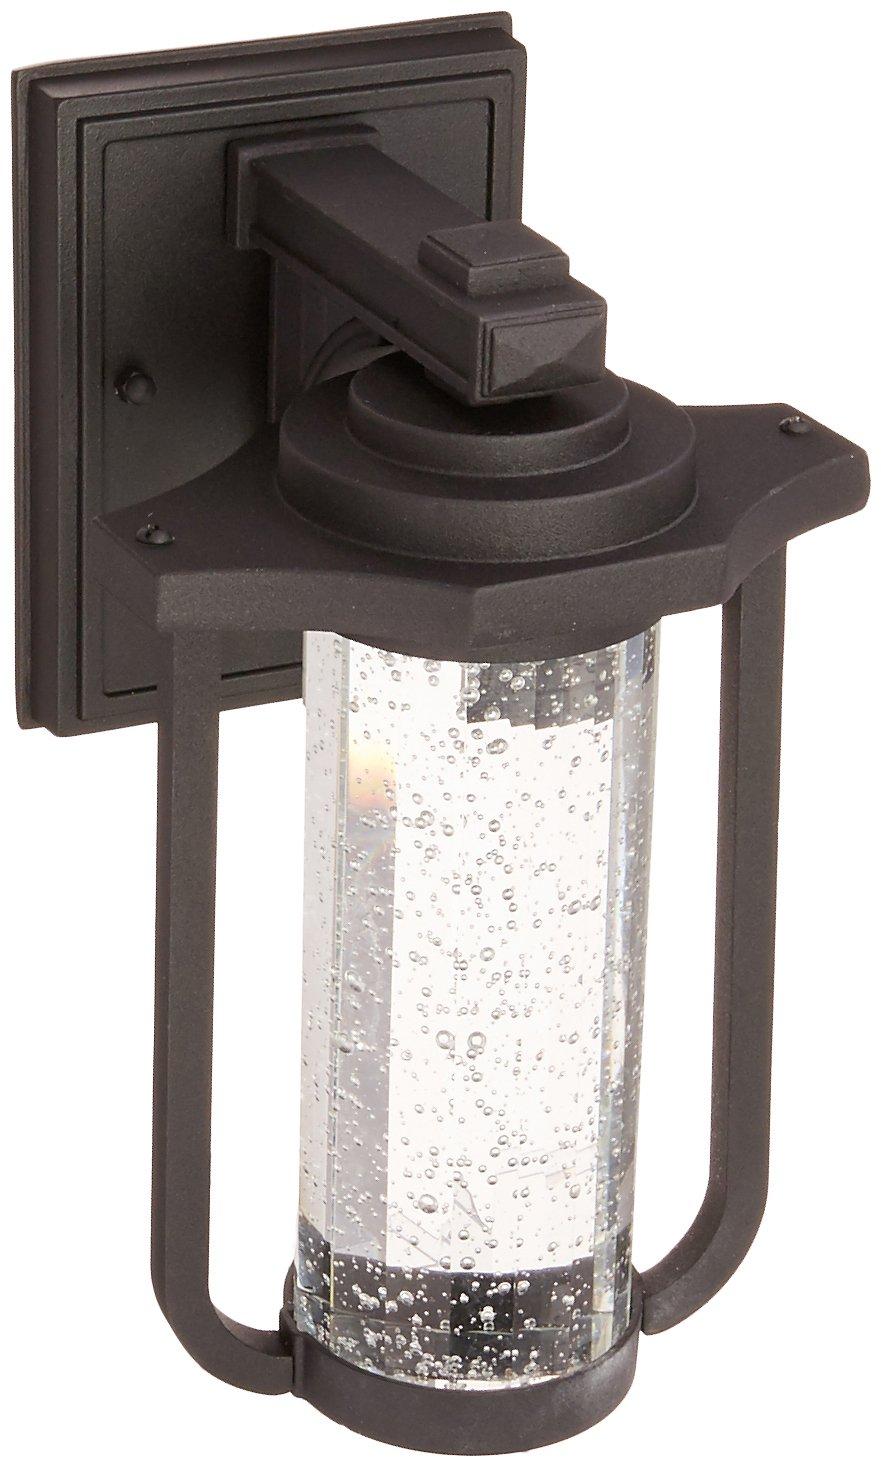 Artcraft Lighting North Star Outdoor LED Wall Mount Porch Light Silver AC9011SL